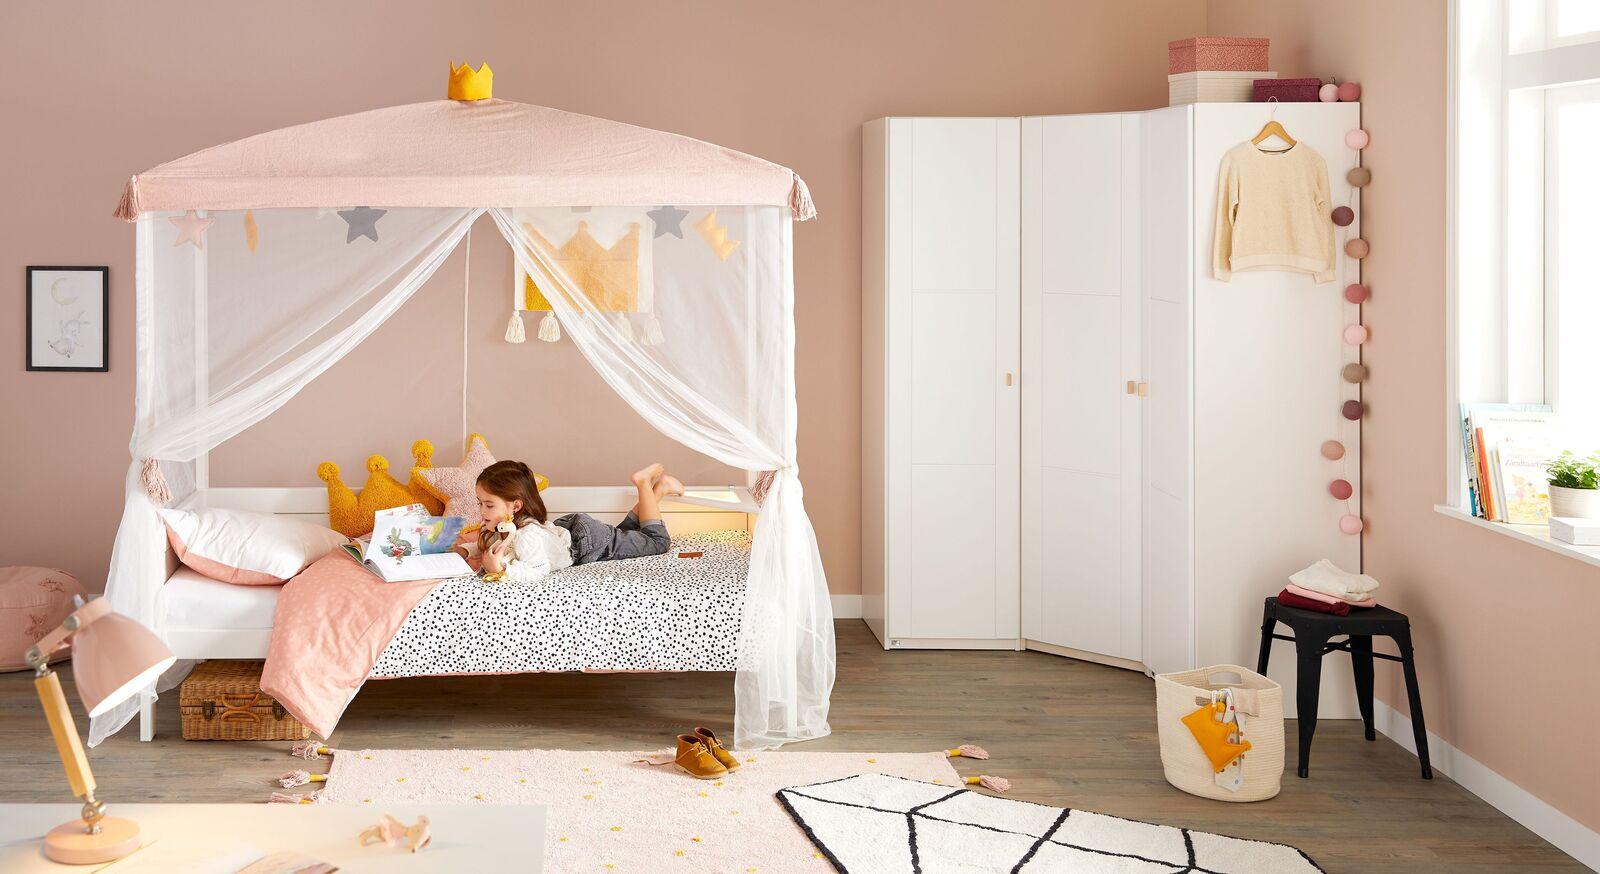 Modernes LIFETIME Kinderzimmer Princess mit Himmelbett